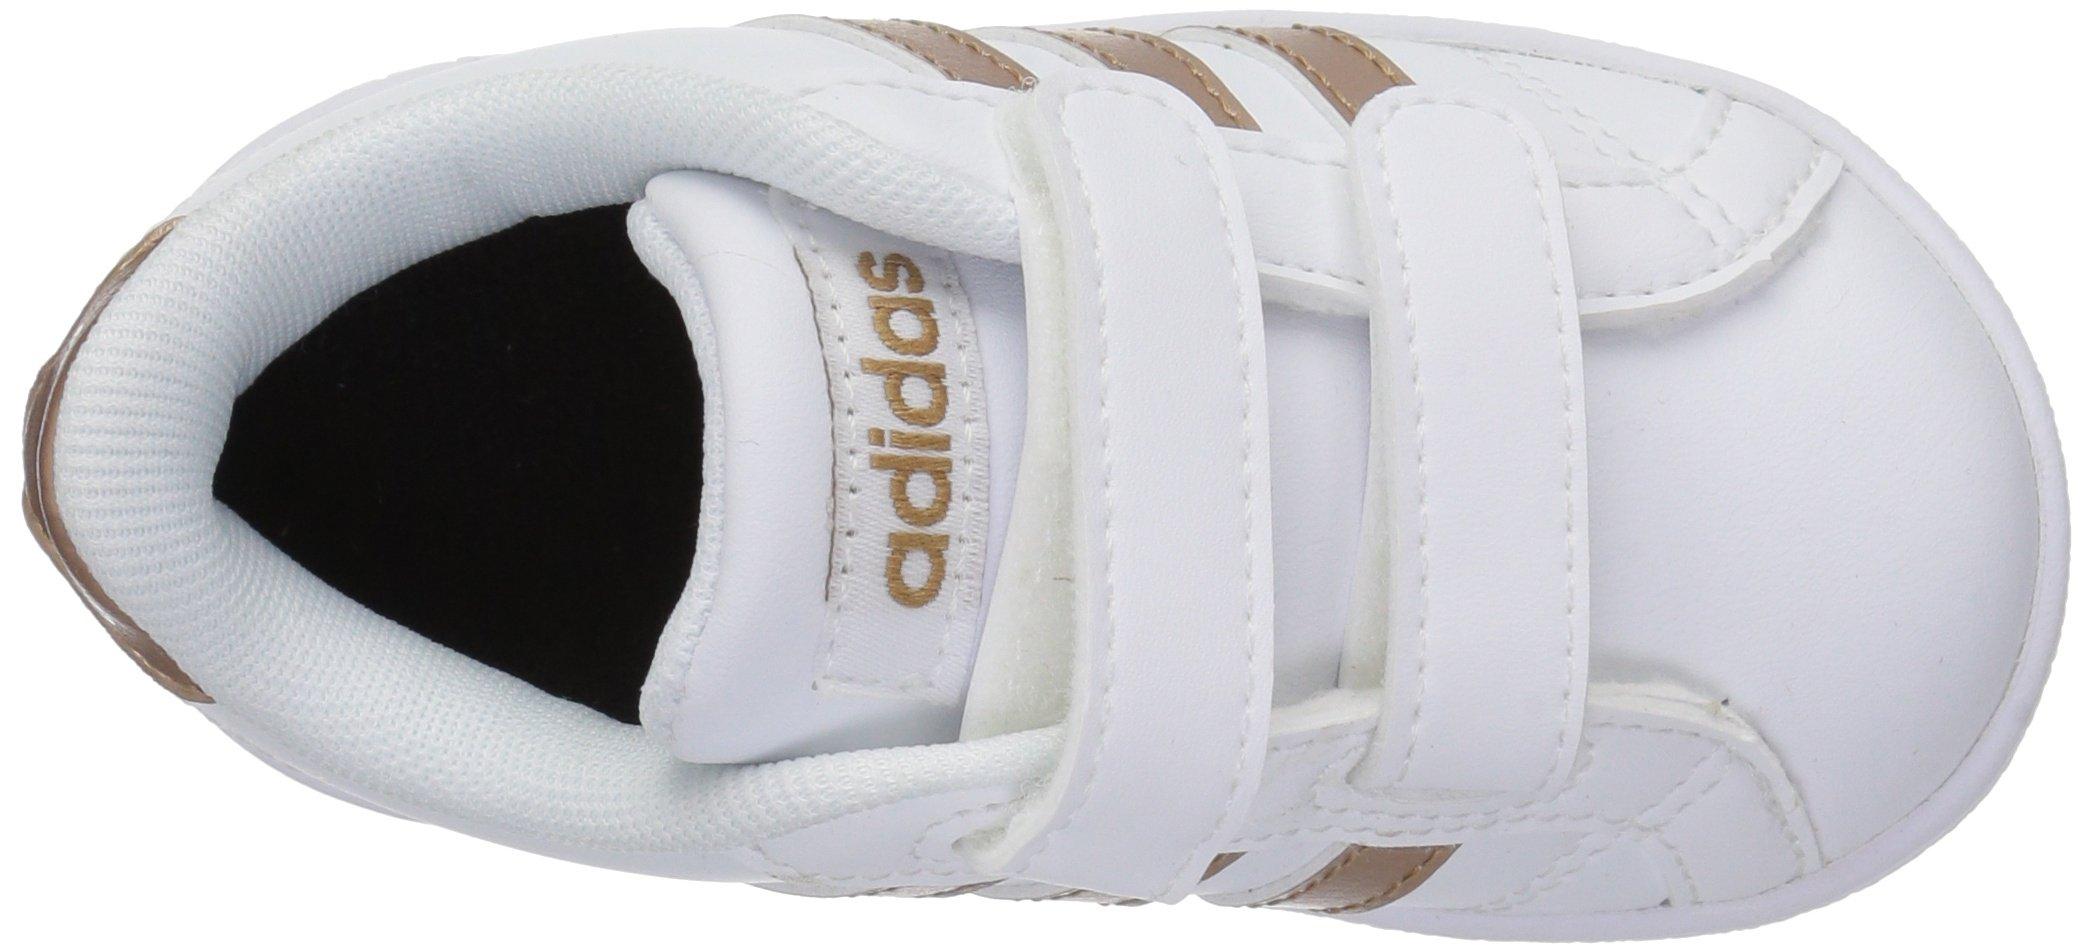 adidas Performance Baby Baseline, White/Copper Metallic/Black, 6K M US Toddler by adidas (Image #10)